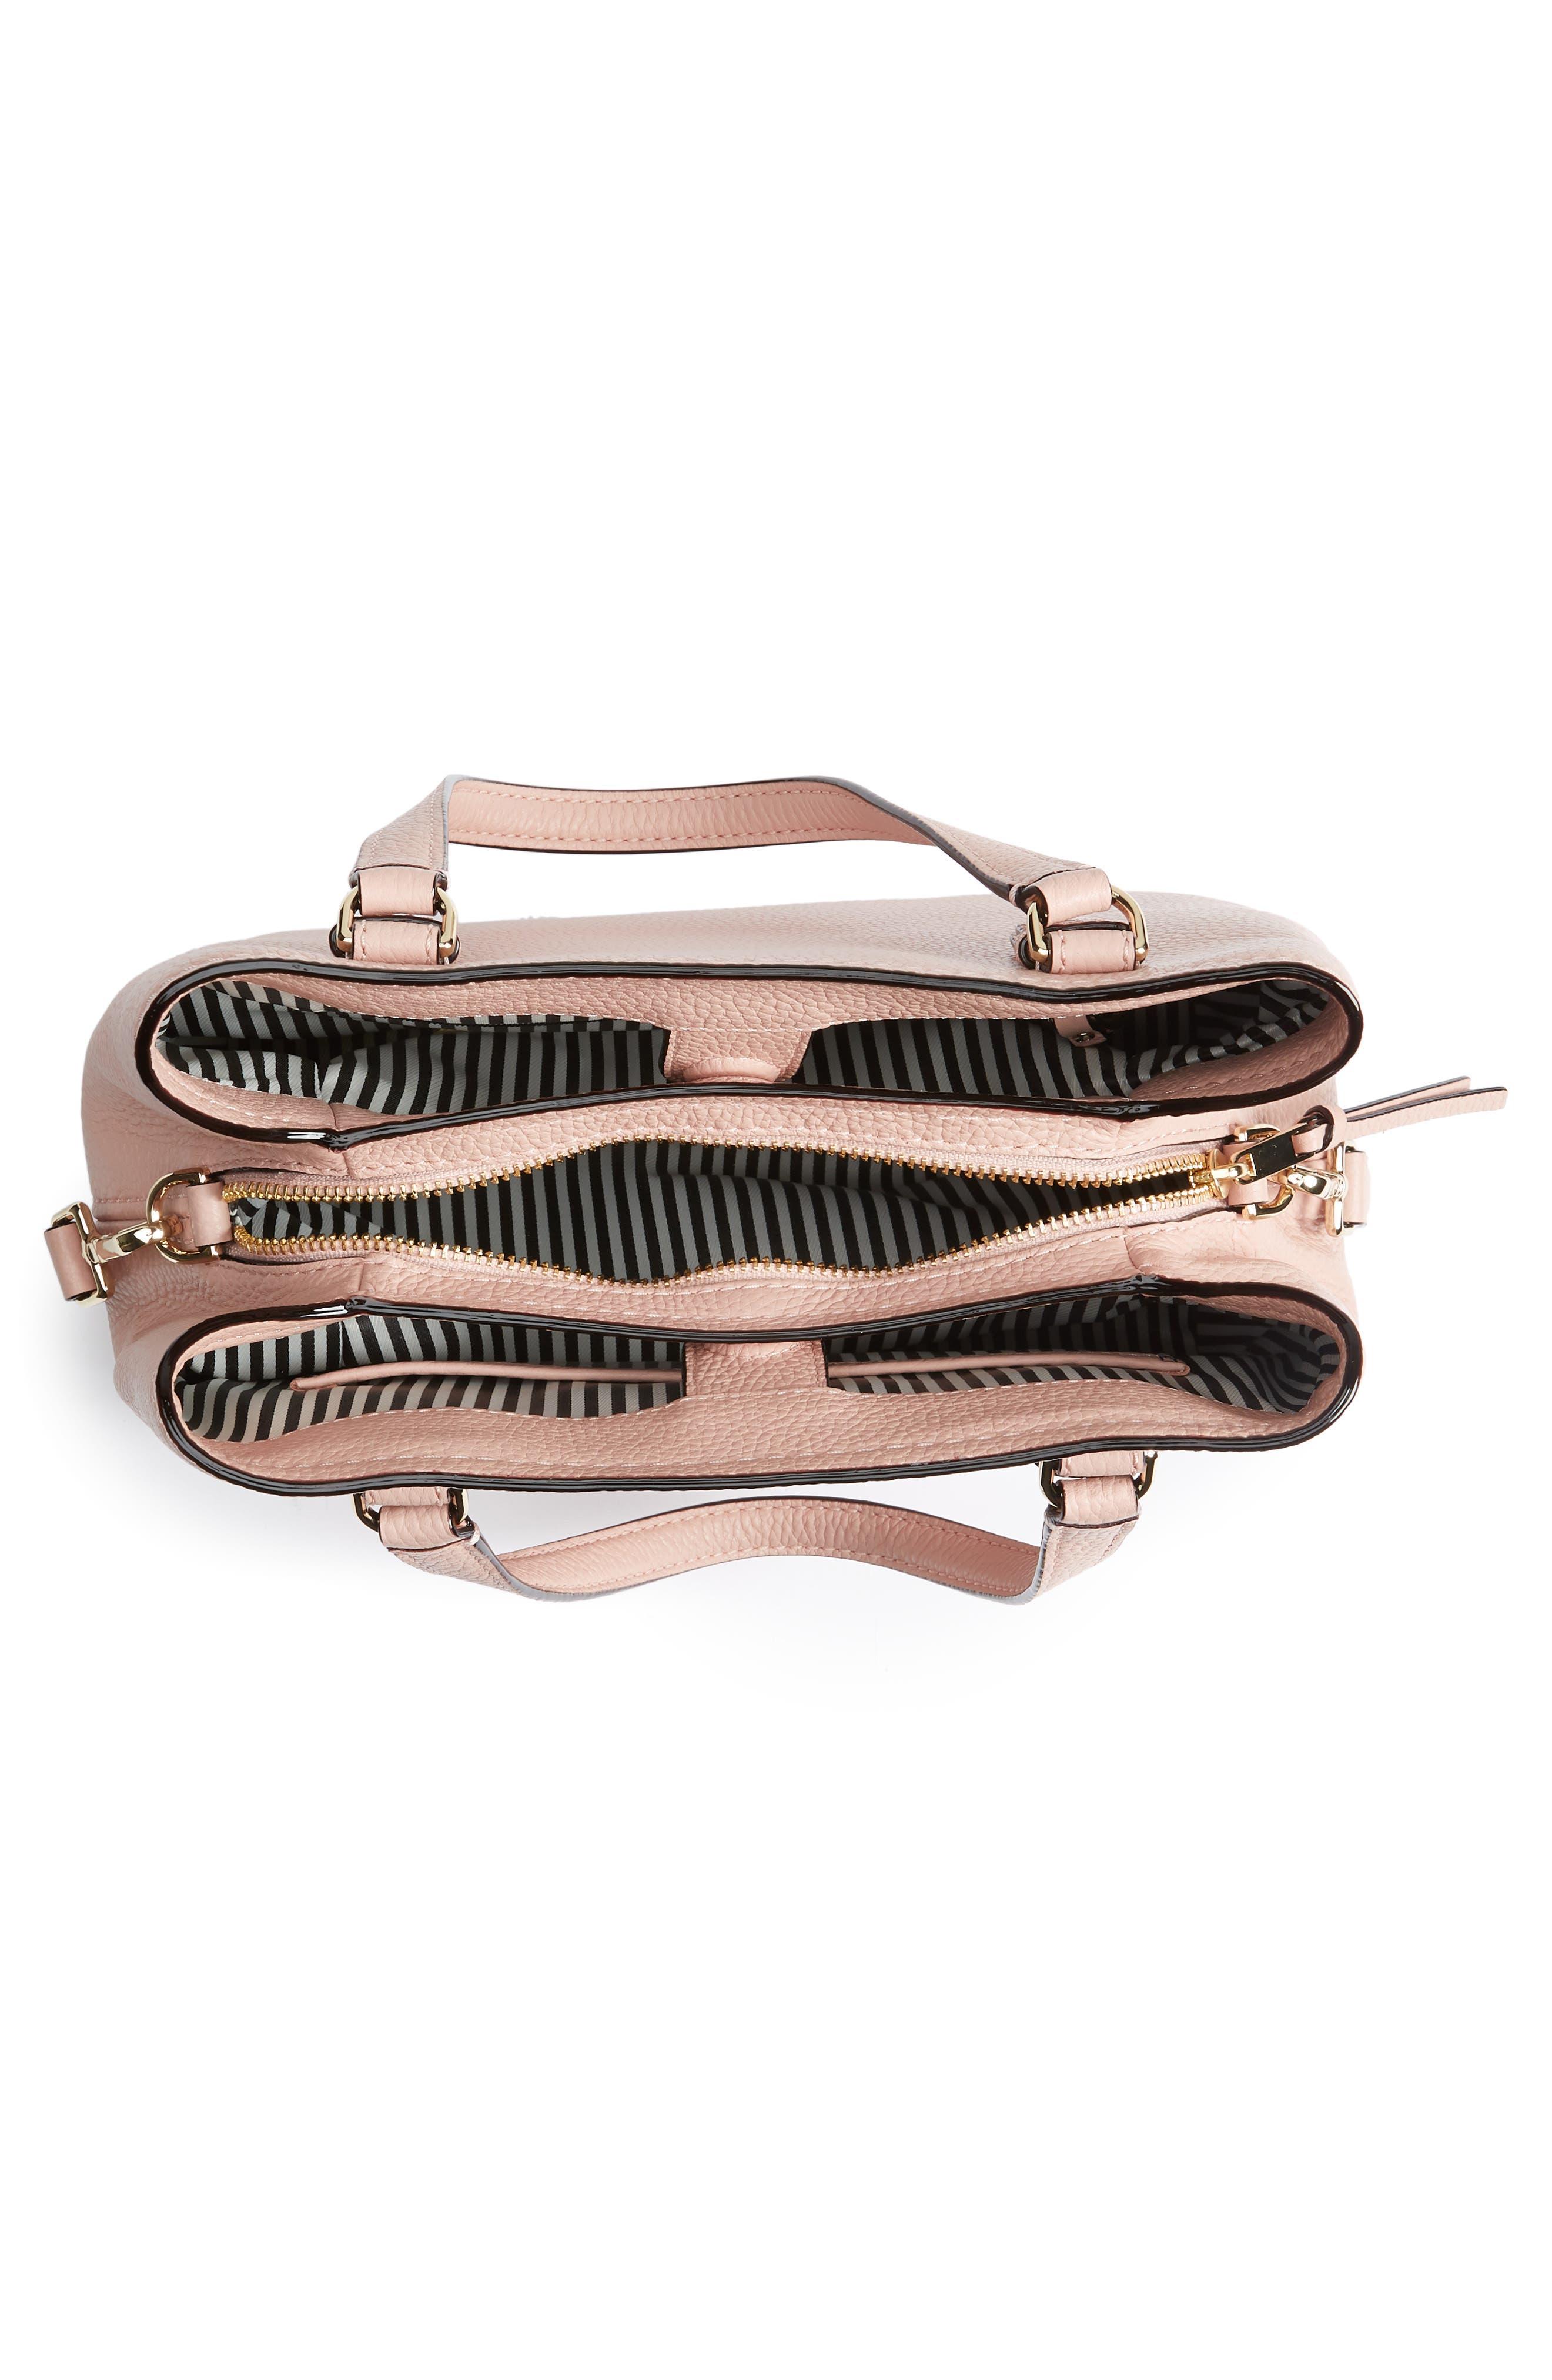 jackson street – small octavia leather satchel,                             Alternate thumbnail 4, color,                             Rosy Cheeks